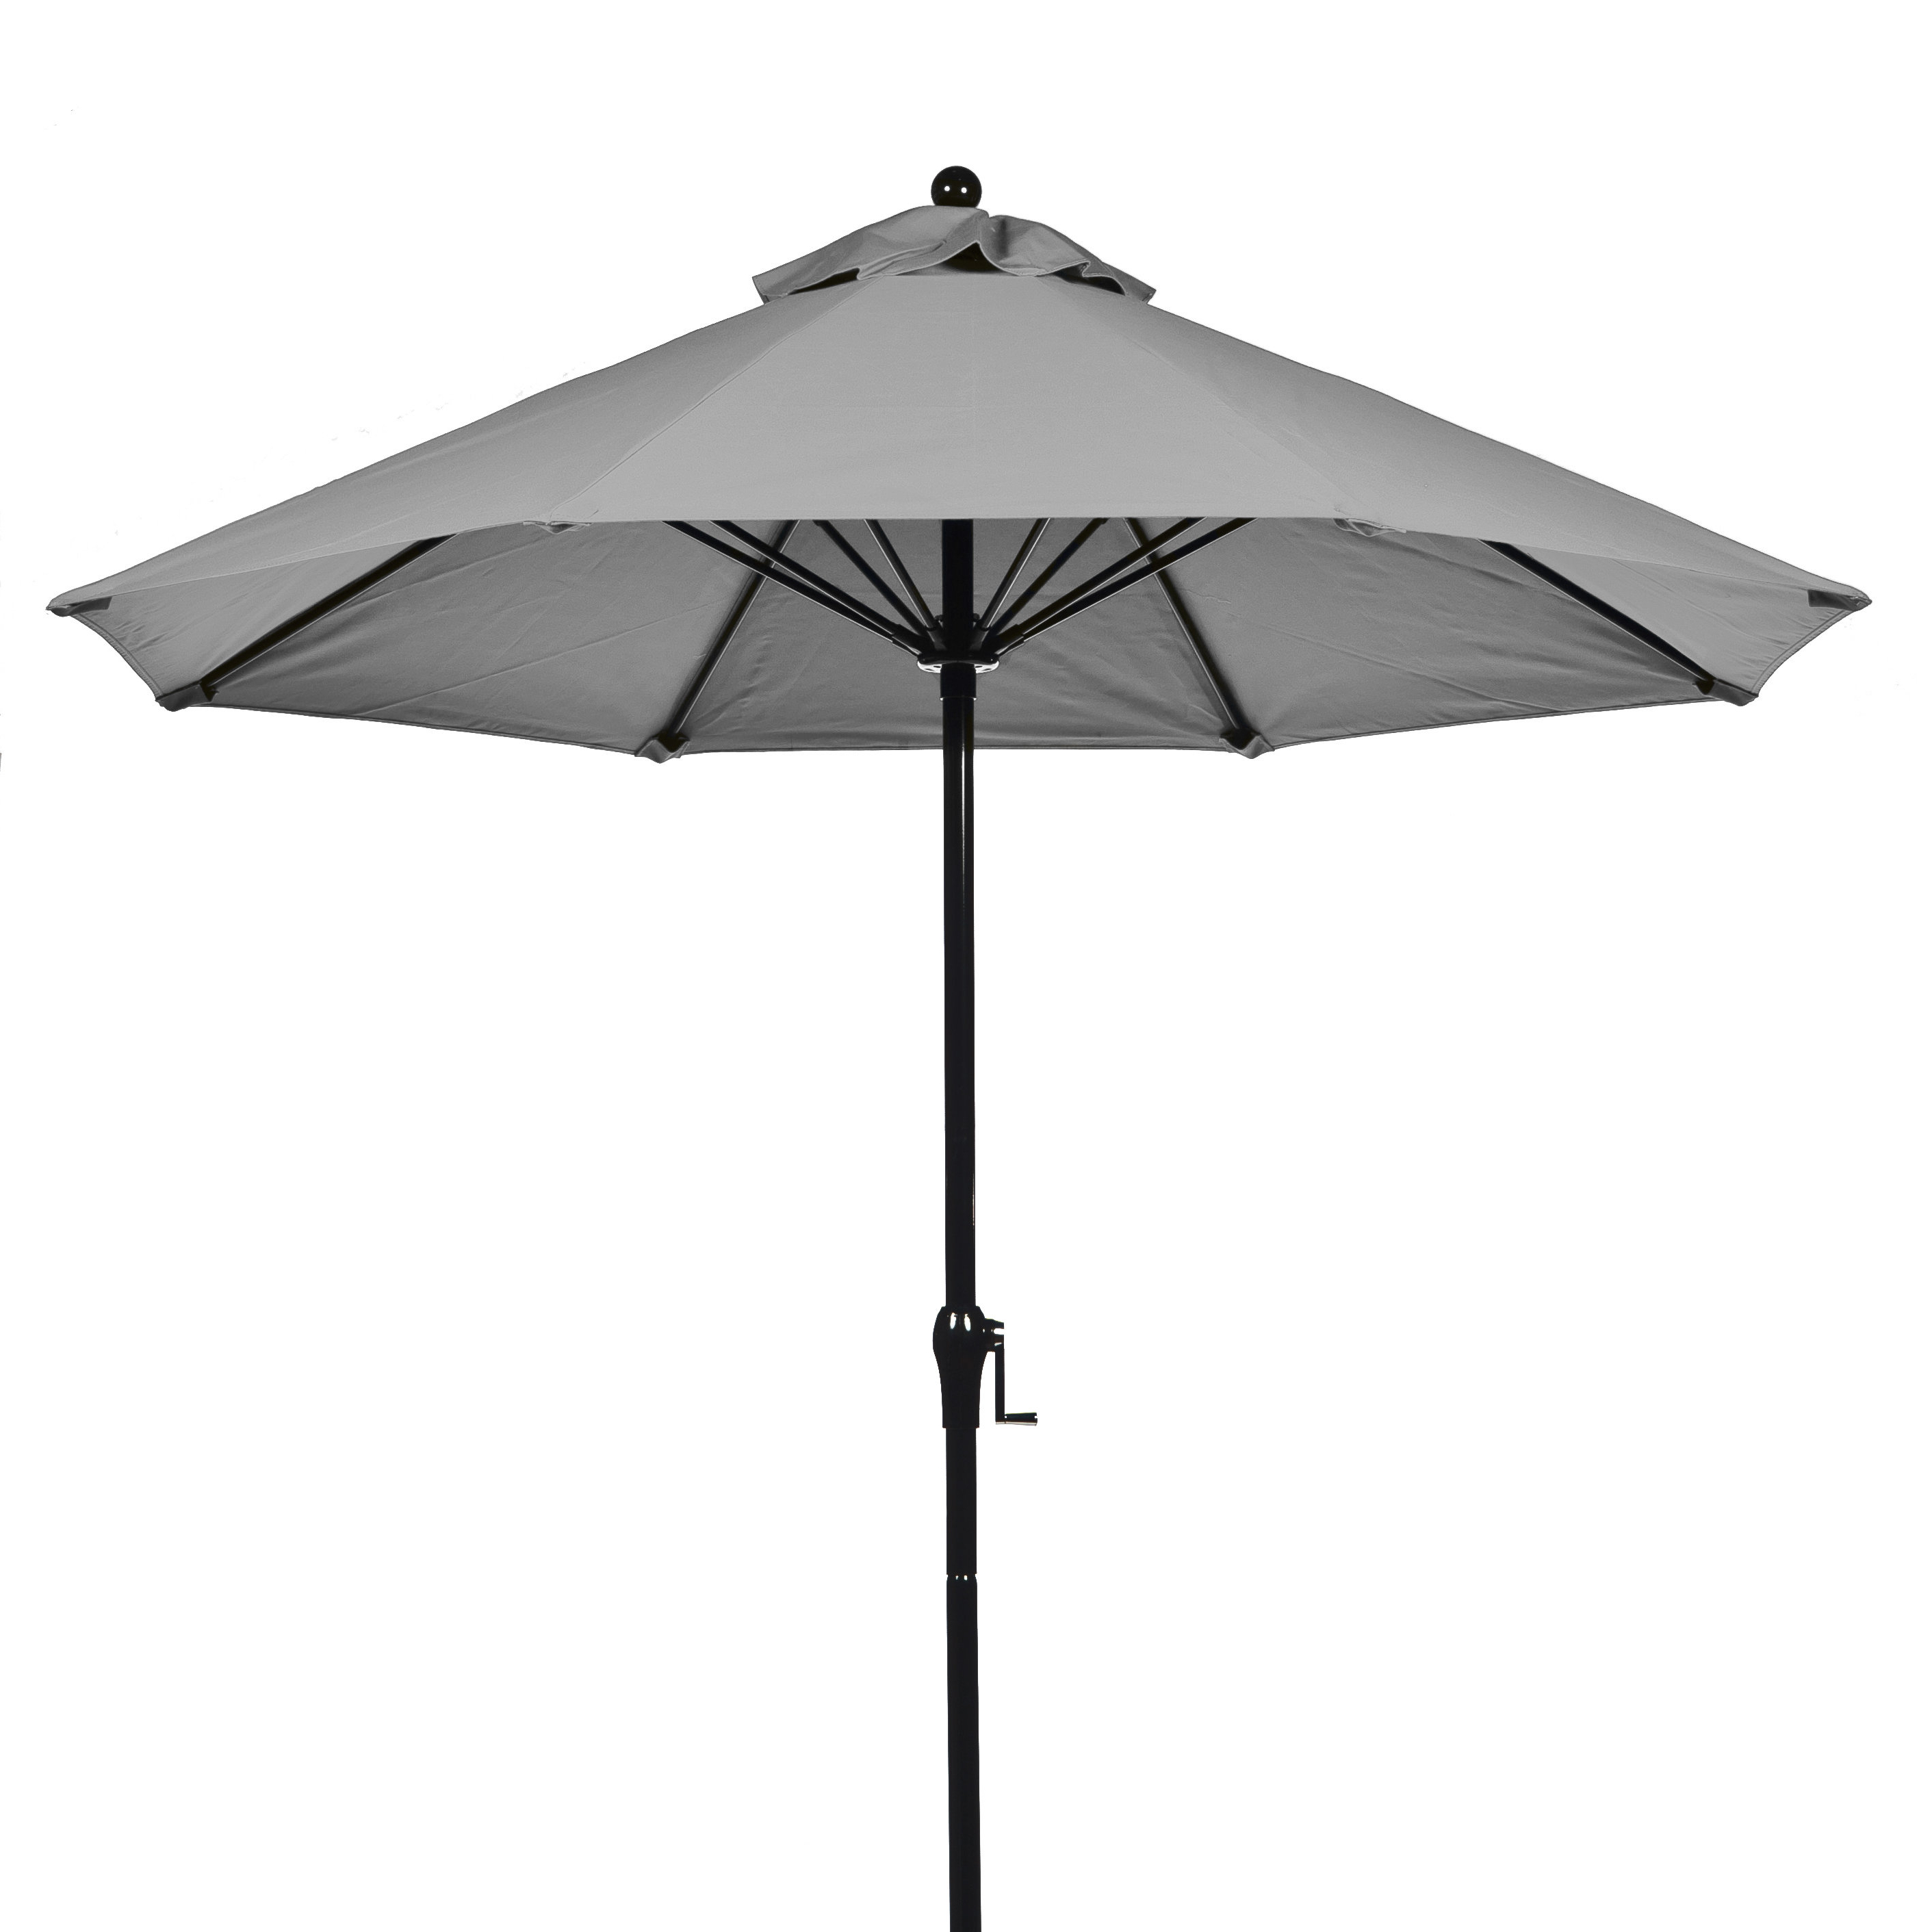 2020 Brookland Market Umbrellas Pertaining To 9' Market Umbrella (Gallery 6 of 20)